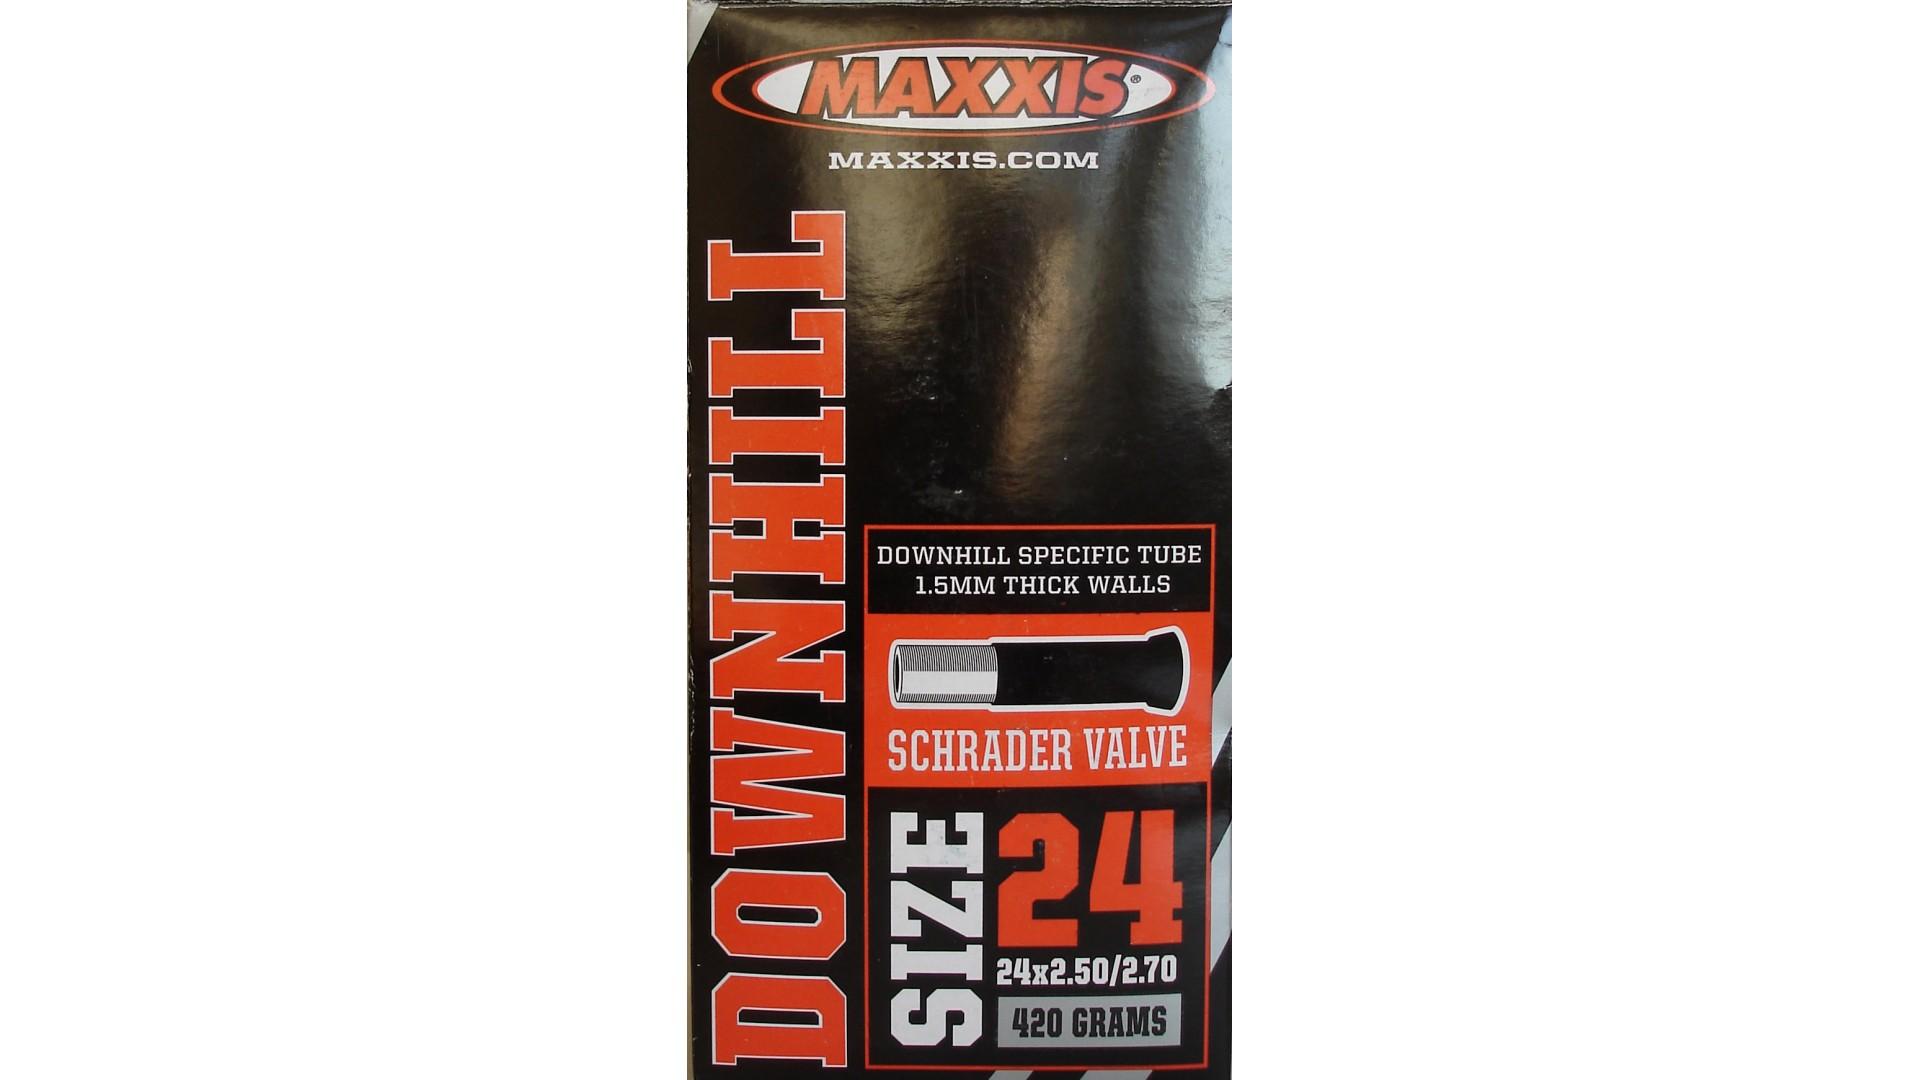 Камера Maxxis 24x2.50/2.70 Downhill AV